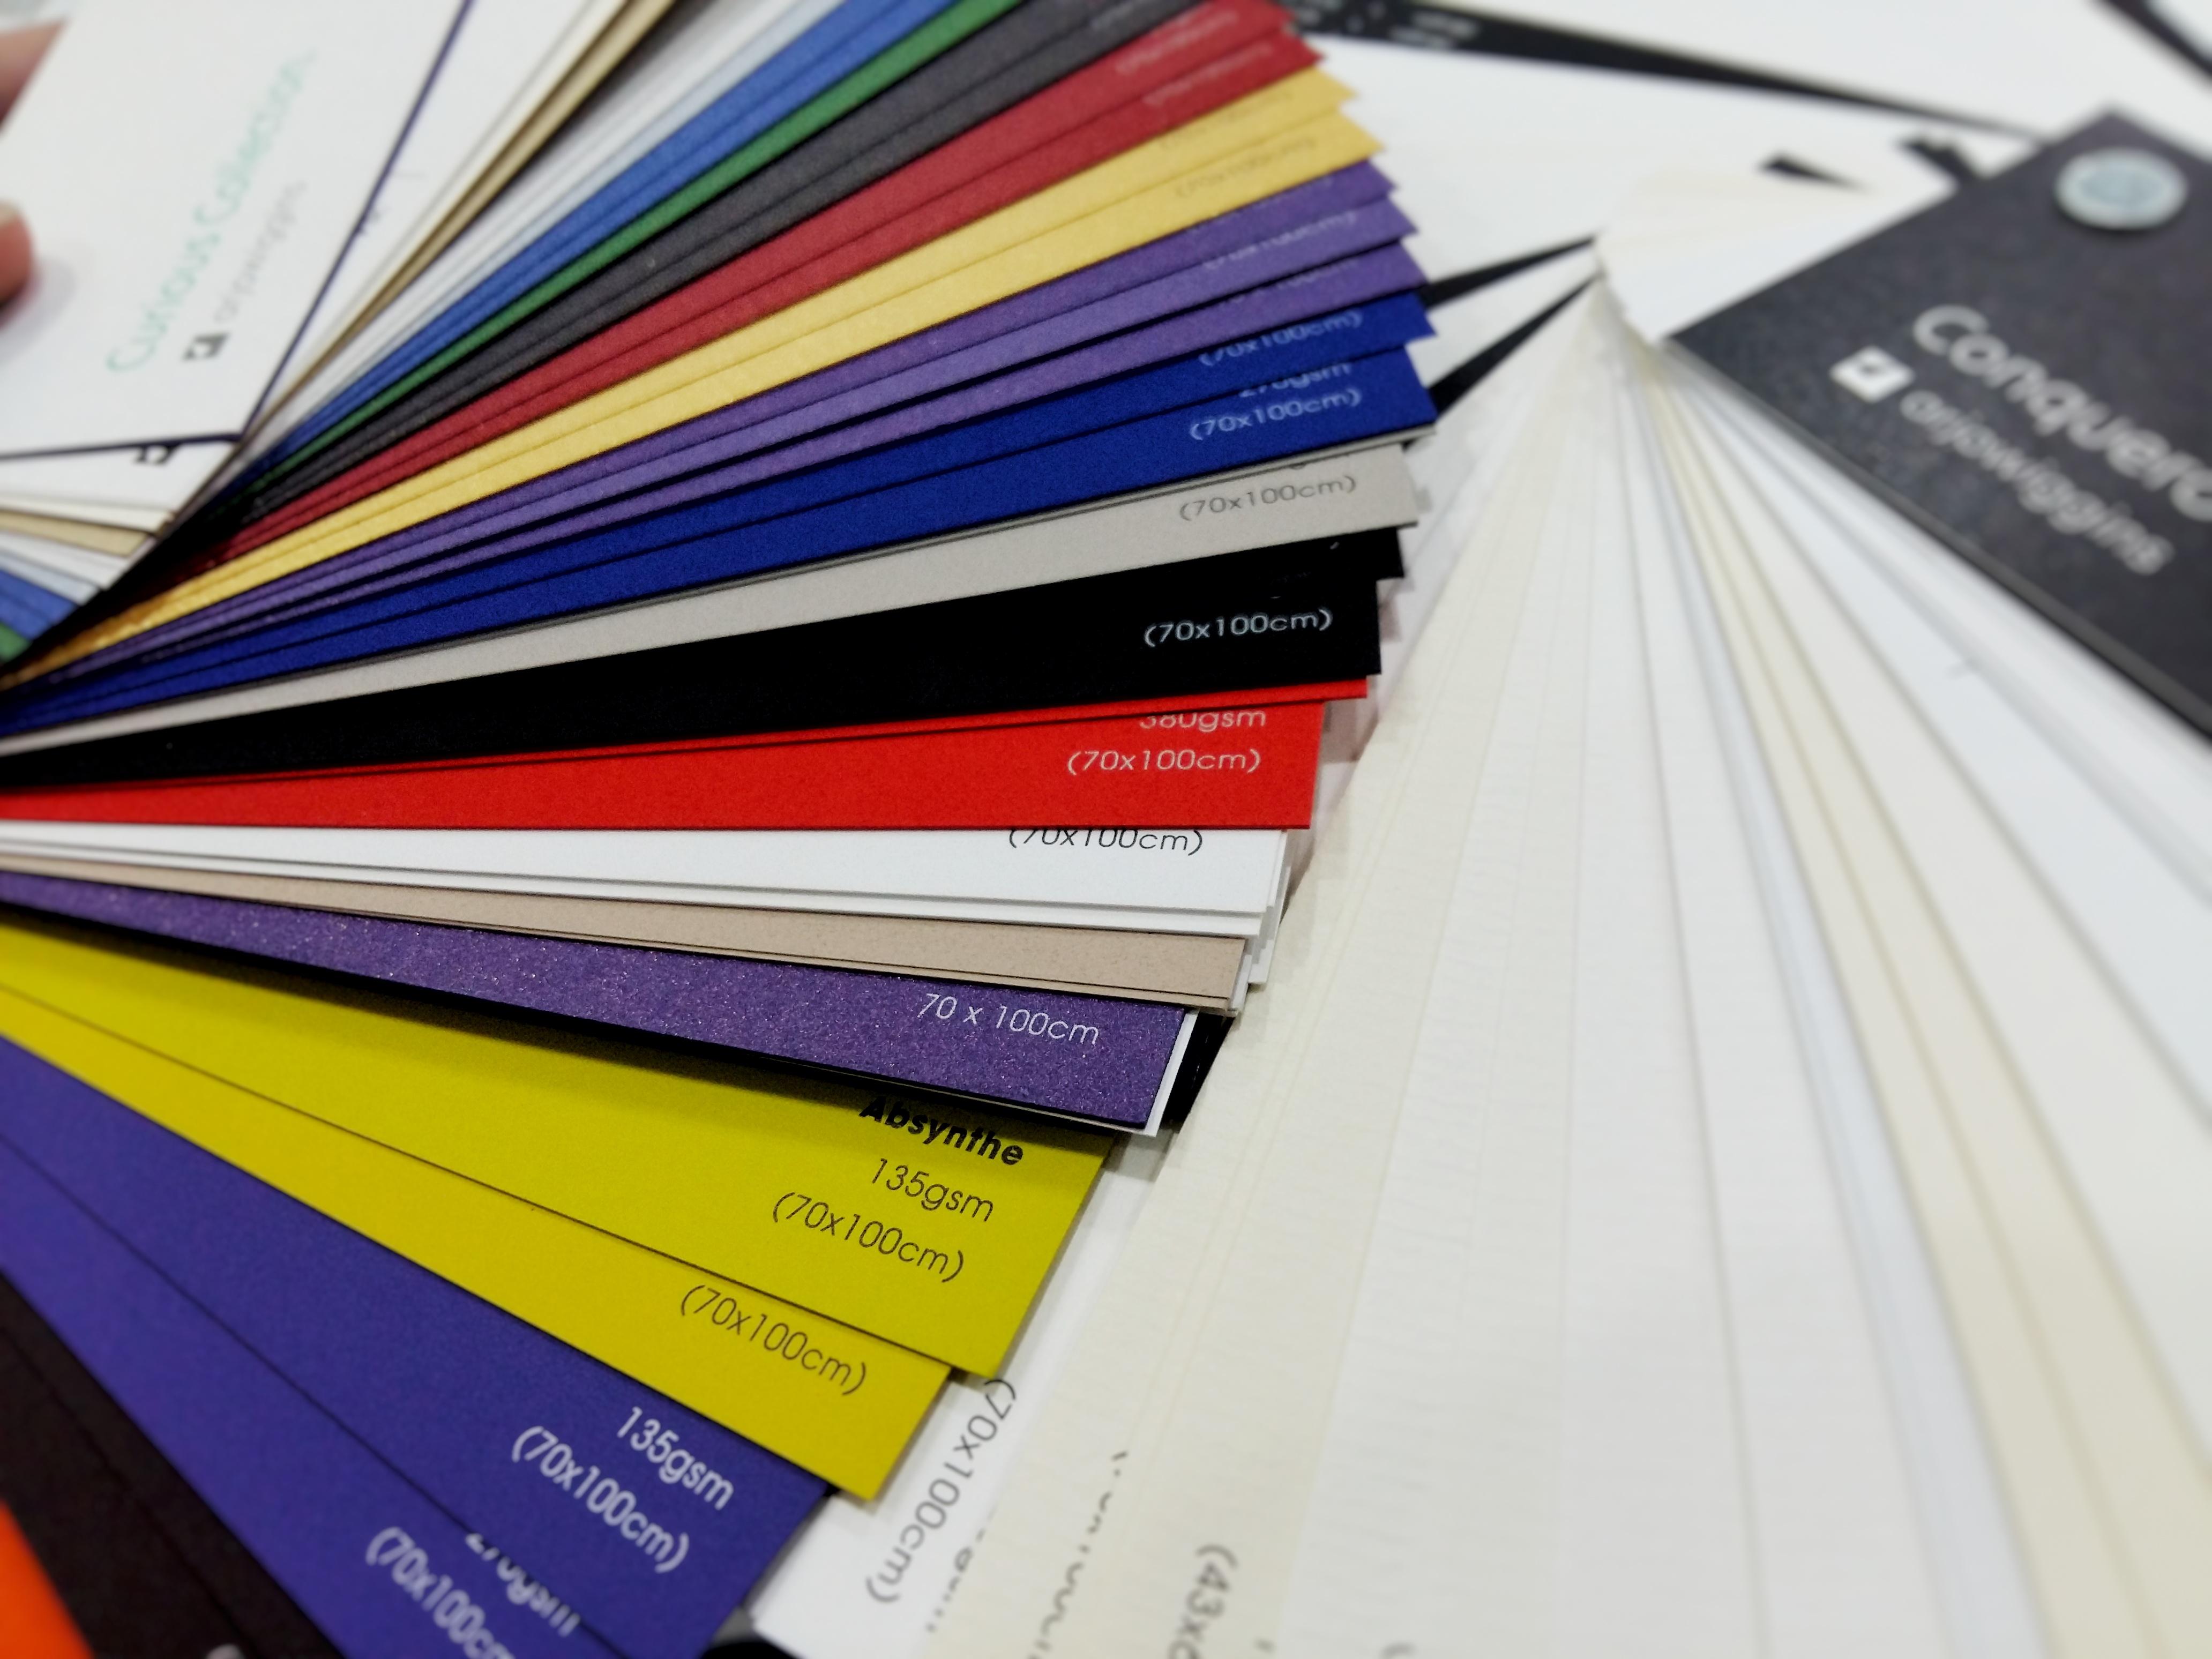 Wings Paper | Các loại giấy mỹ thuật do Wings Paper cung cấp